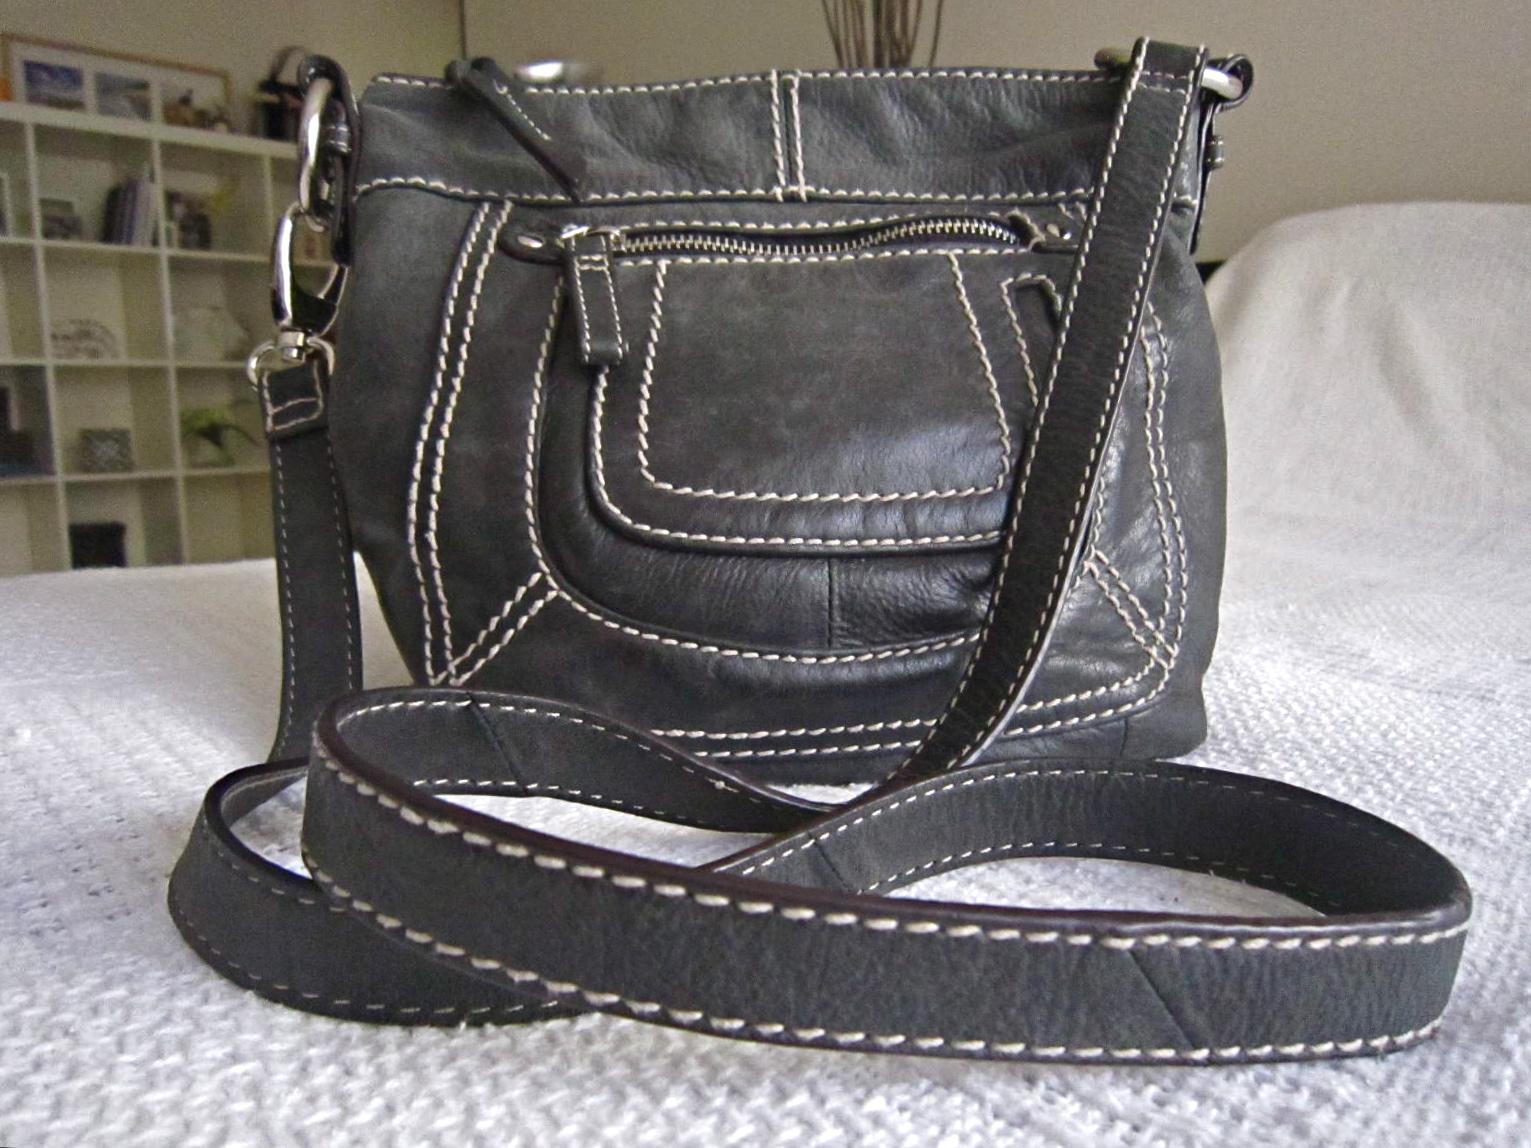 fe50a3ec1 Danier Black Leather Crossbody Bag - Luxurylana Boutique